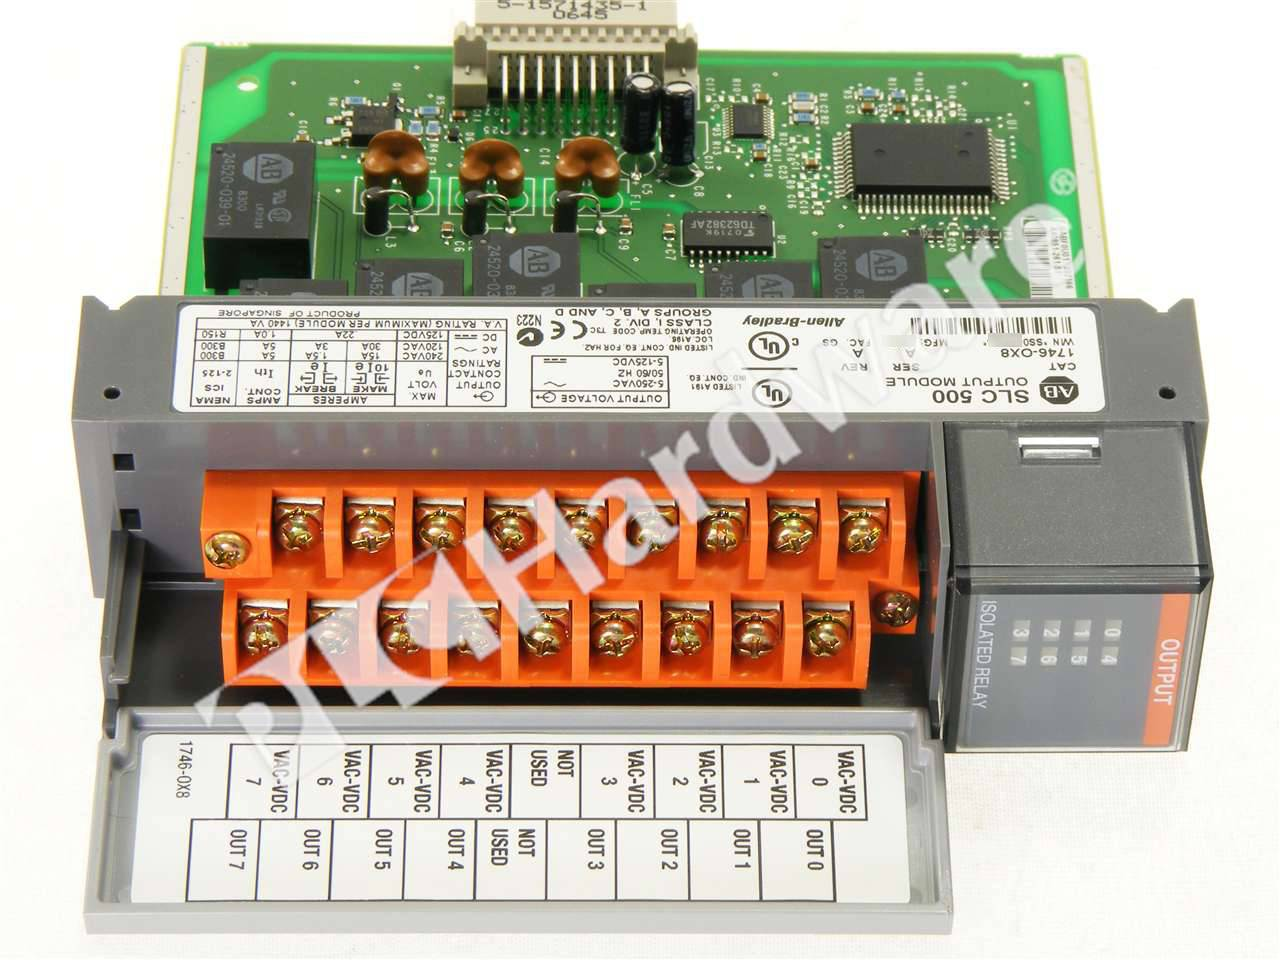 New in Box 1746-OX8 SER A SLC 500 Output Module